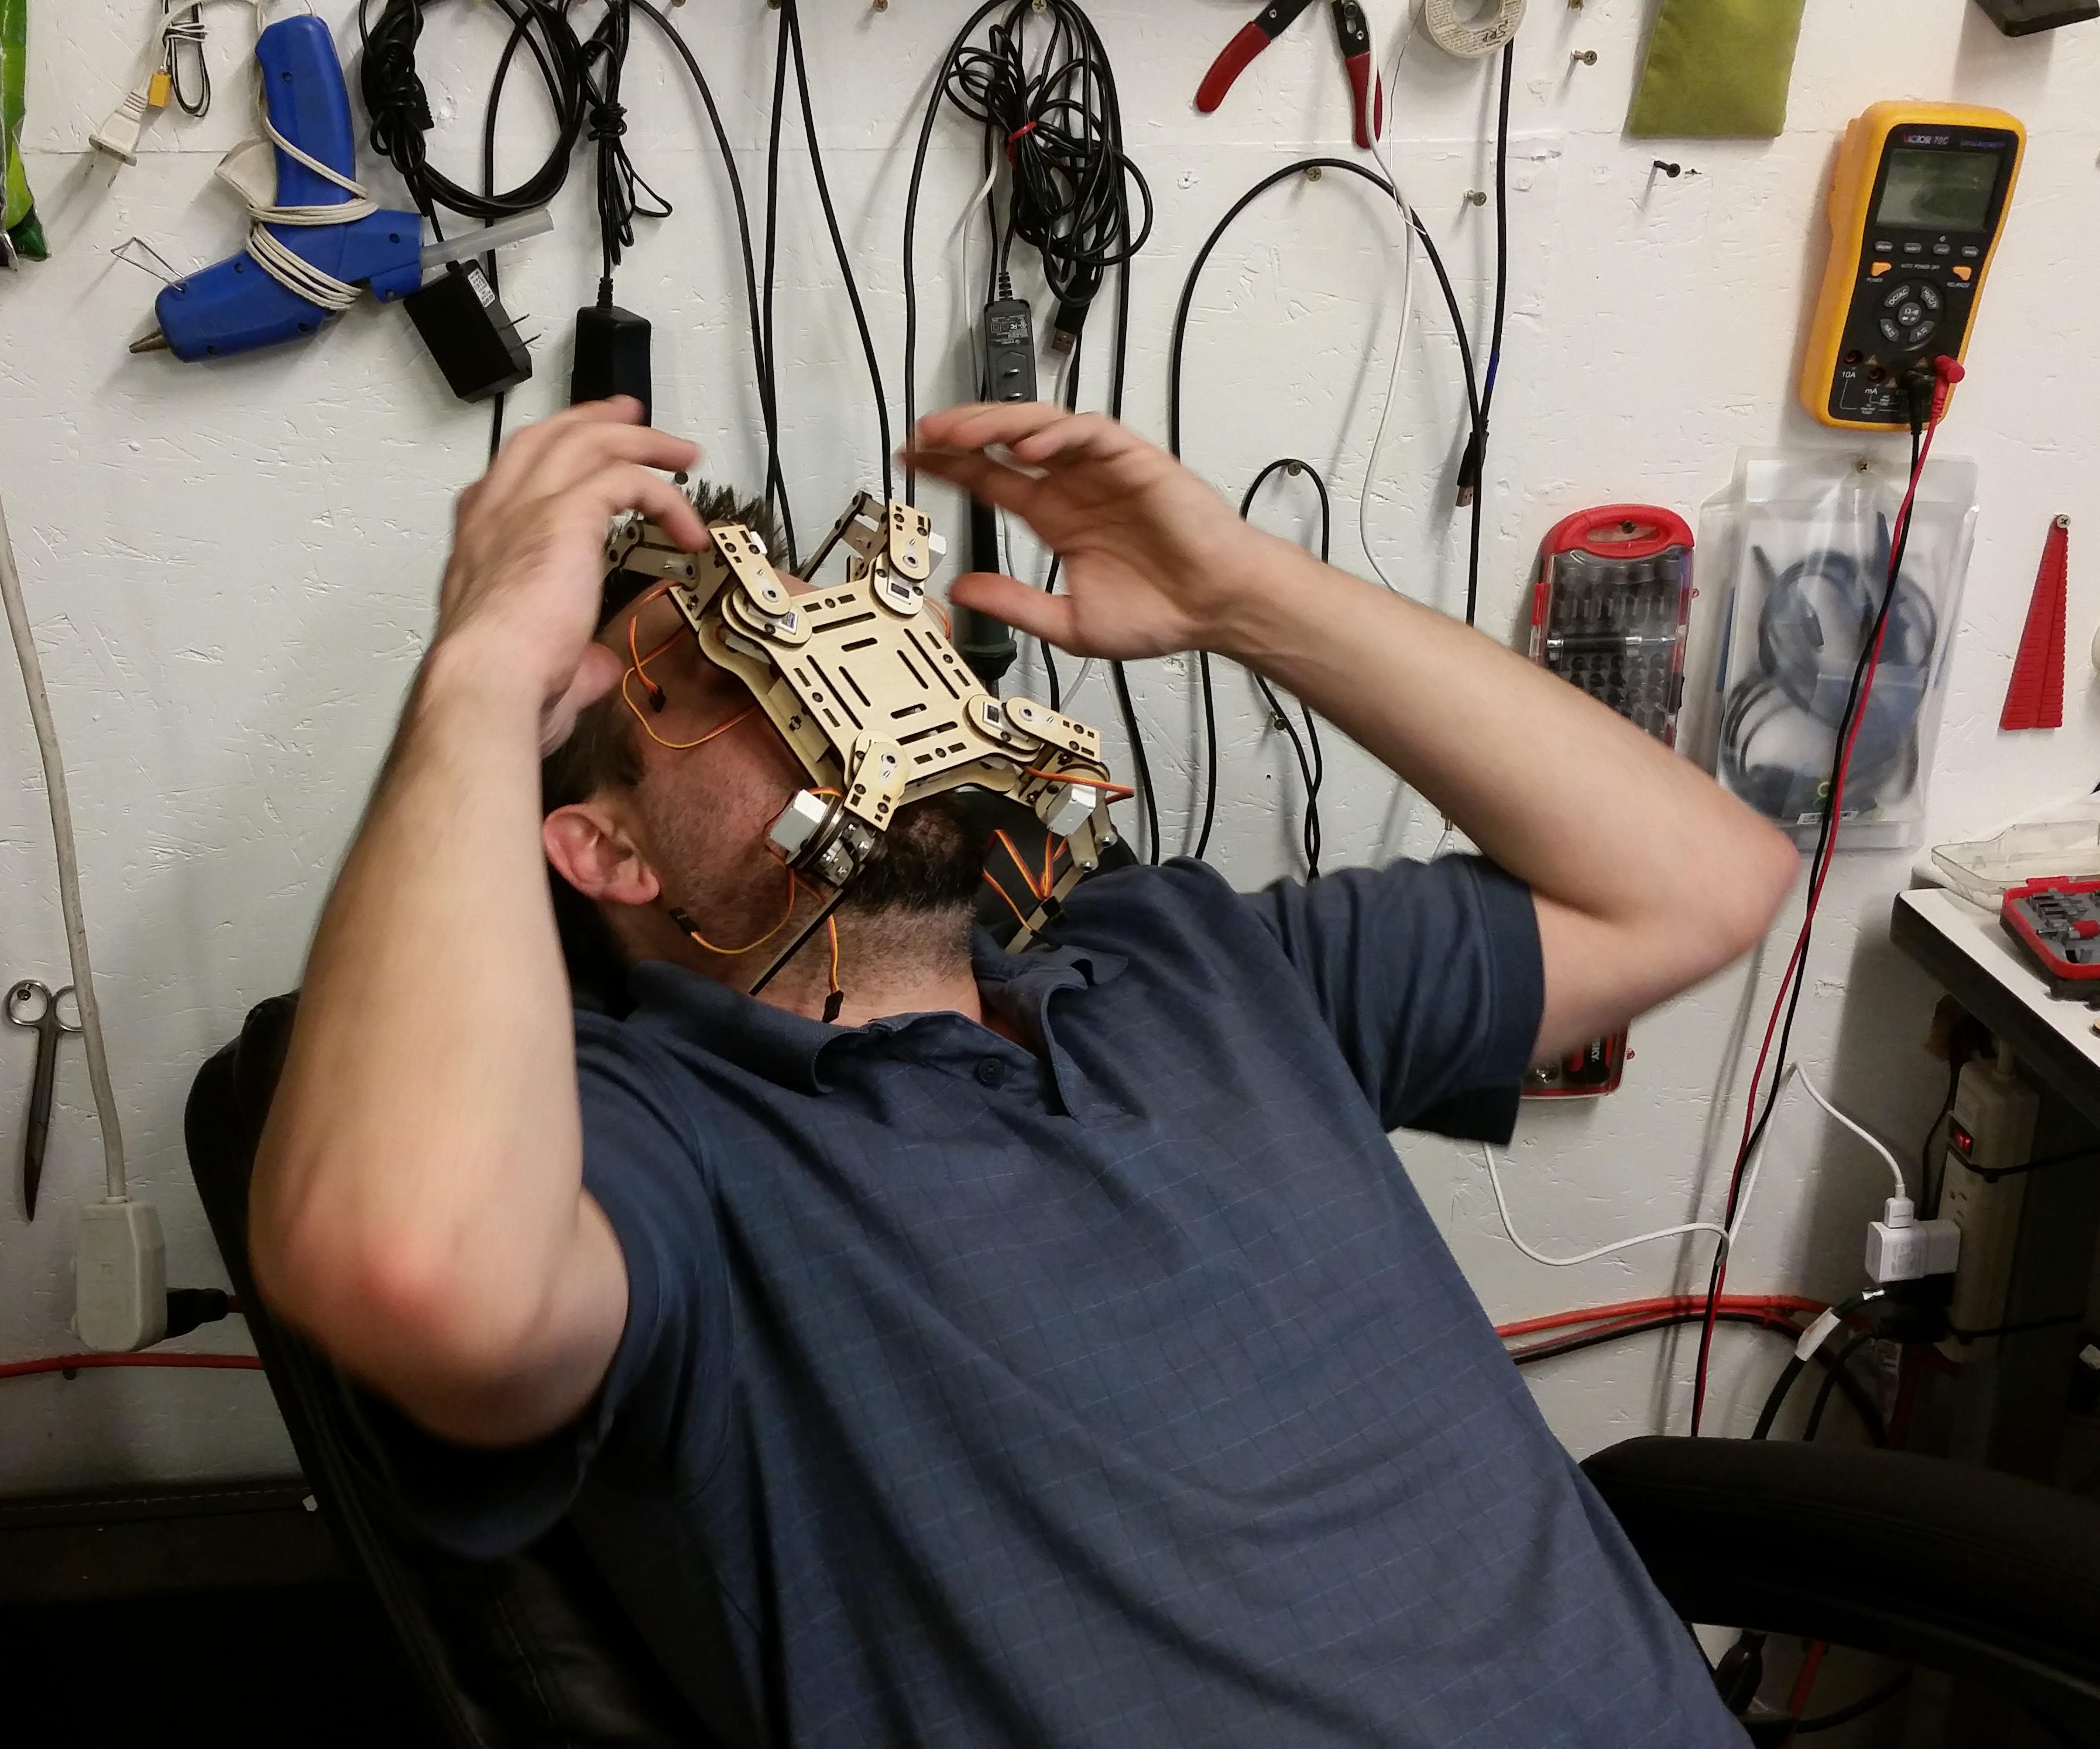 Head_Crap.jpg Download free STL file mePed Quadruped Robot • 3D printing template, MinorSymphony